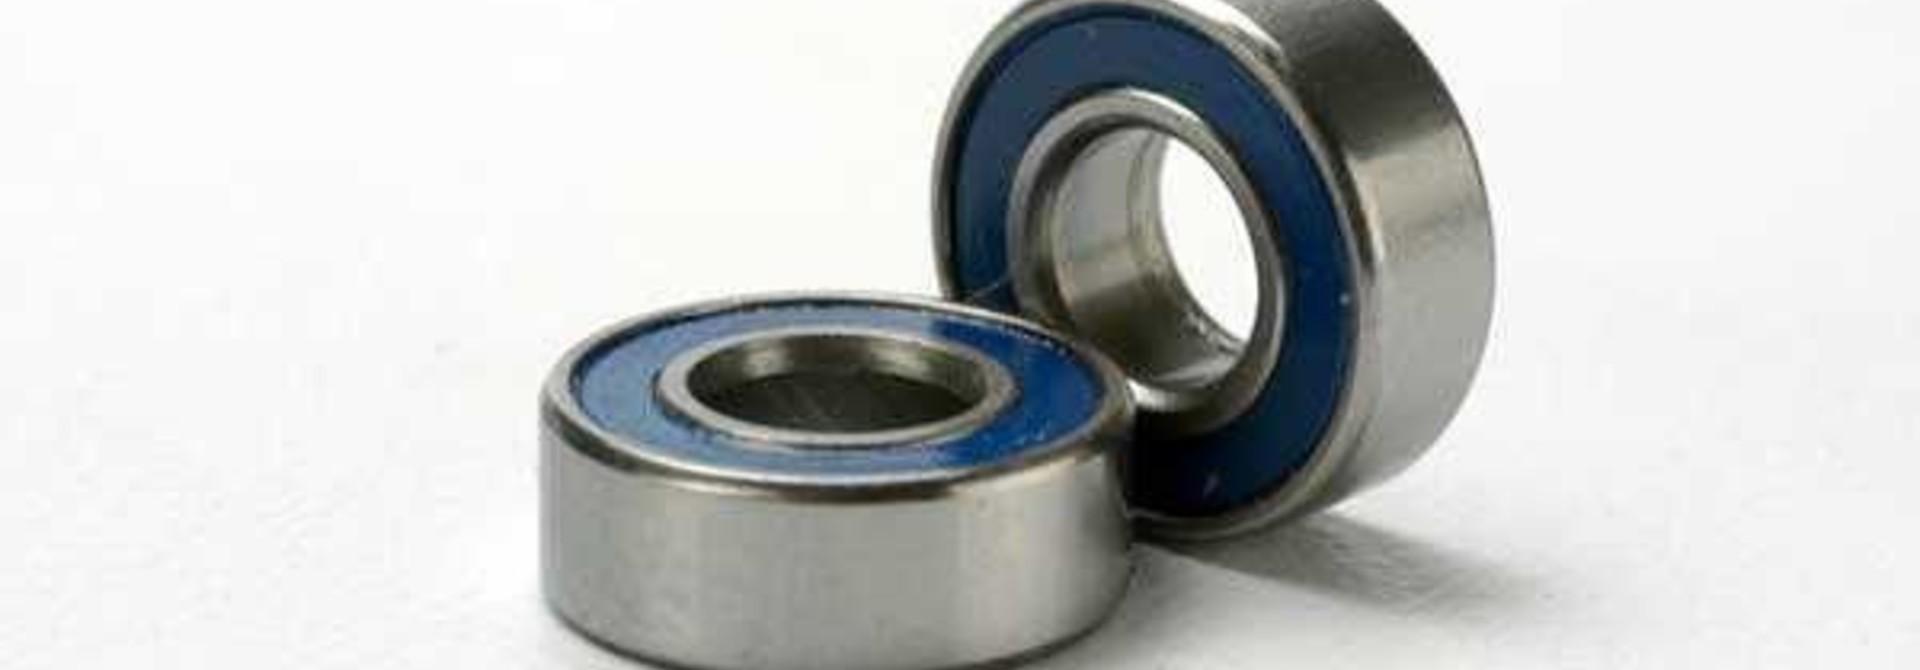 Ball bearings, blue rubber sealed (5x11x4mm) (2), TRX5116